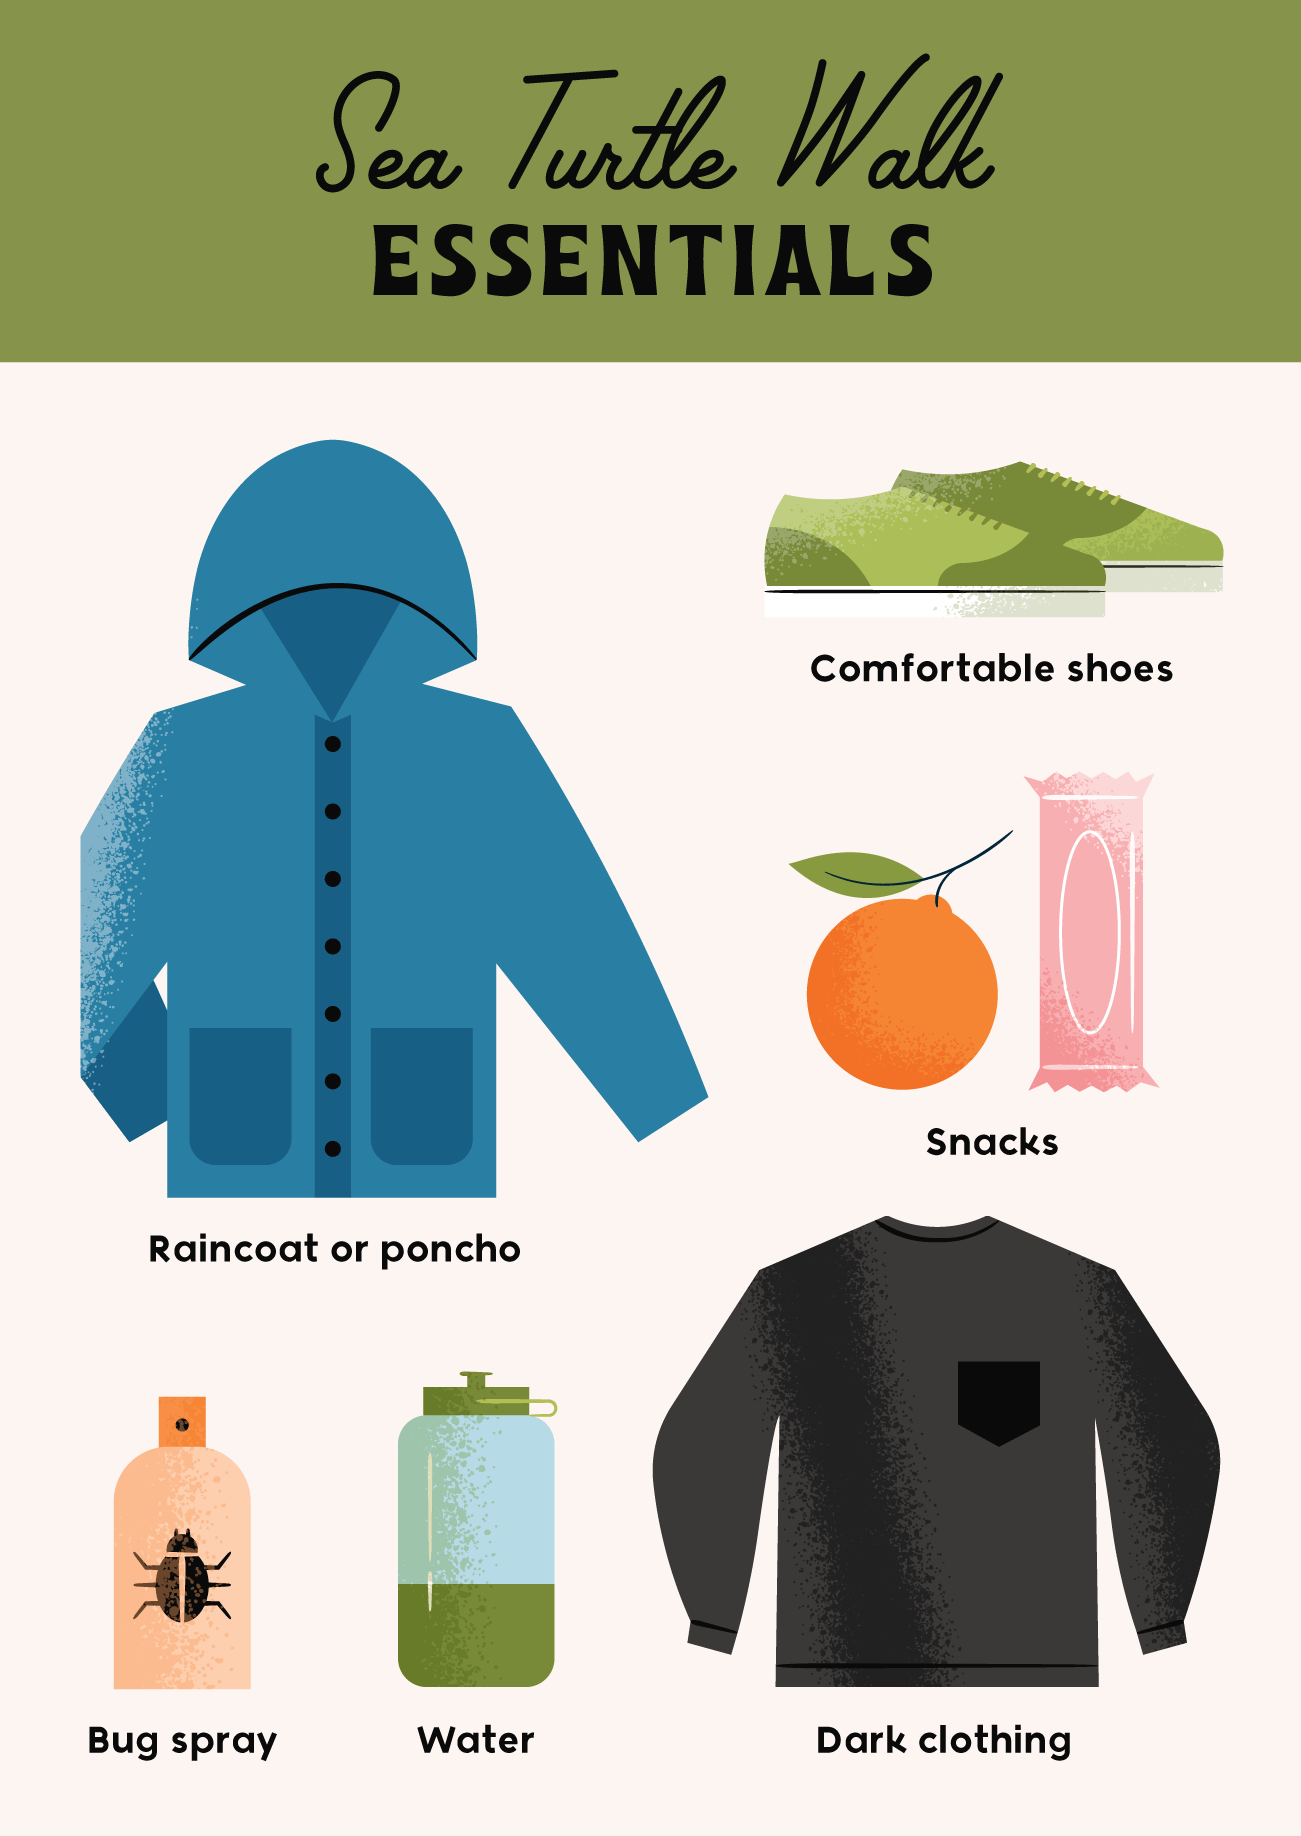 sea turtle walk essentials